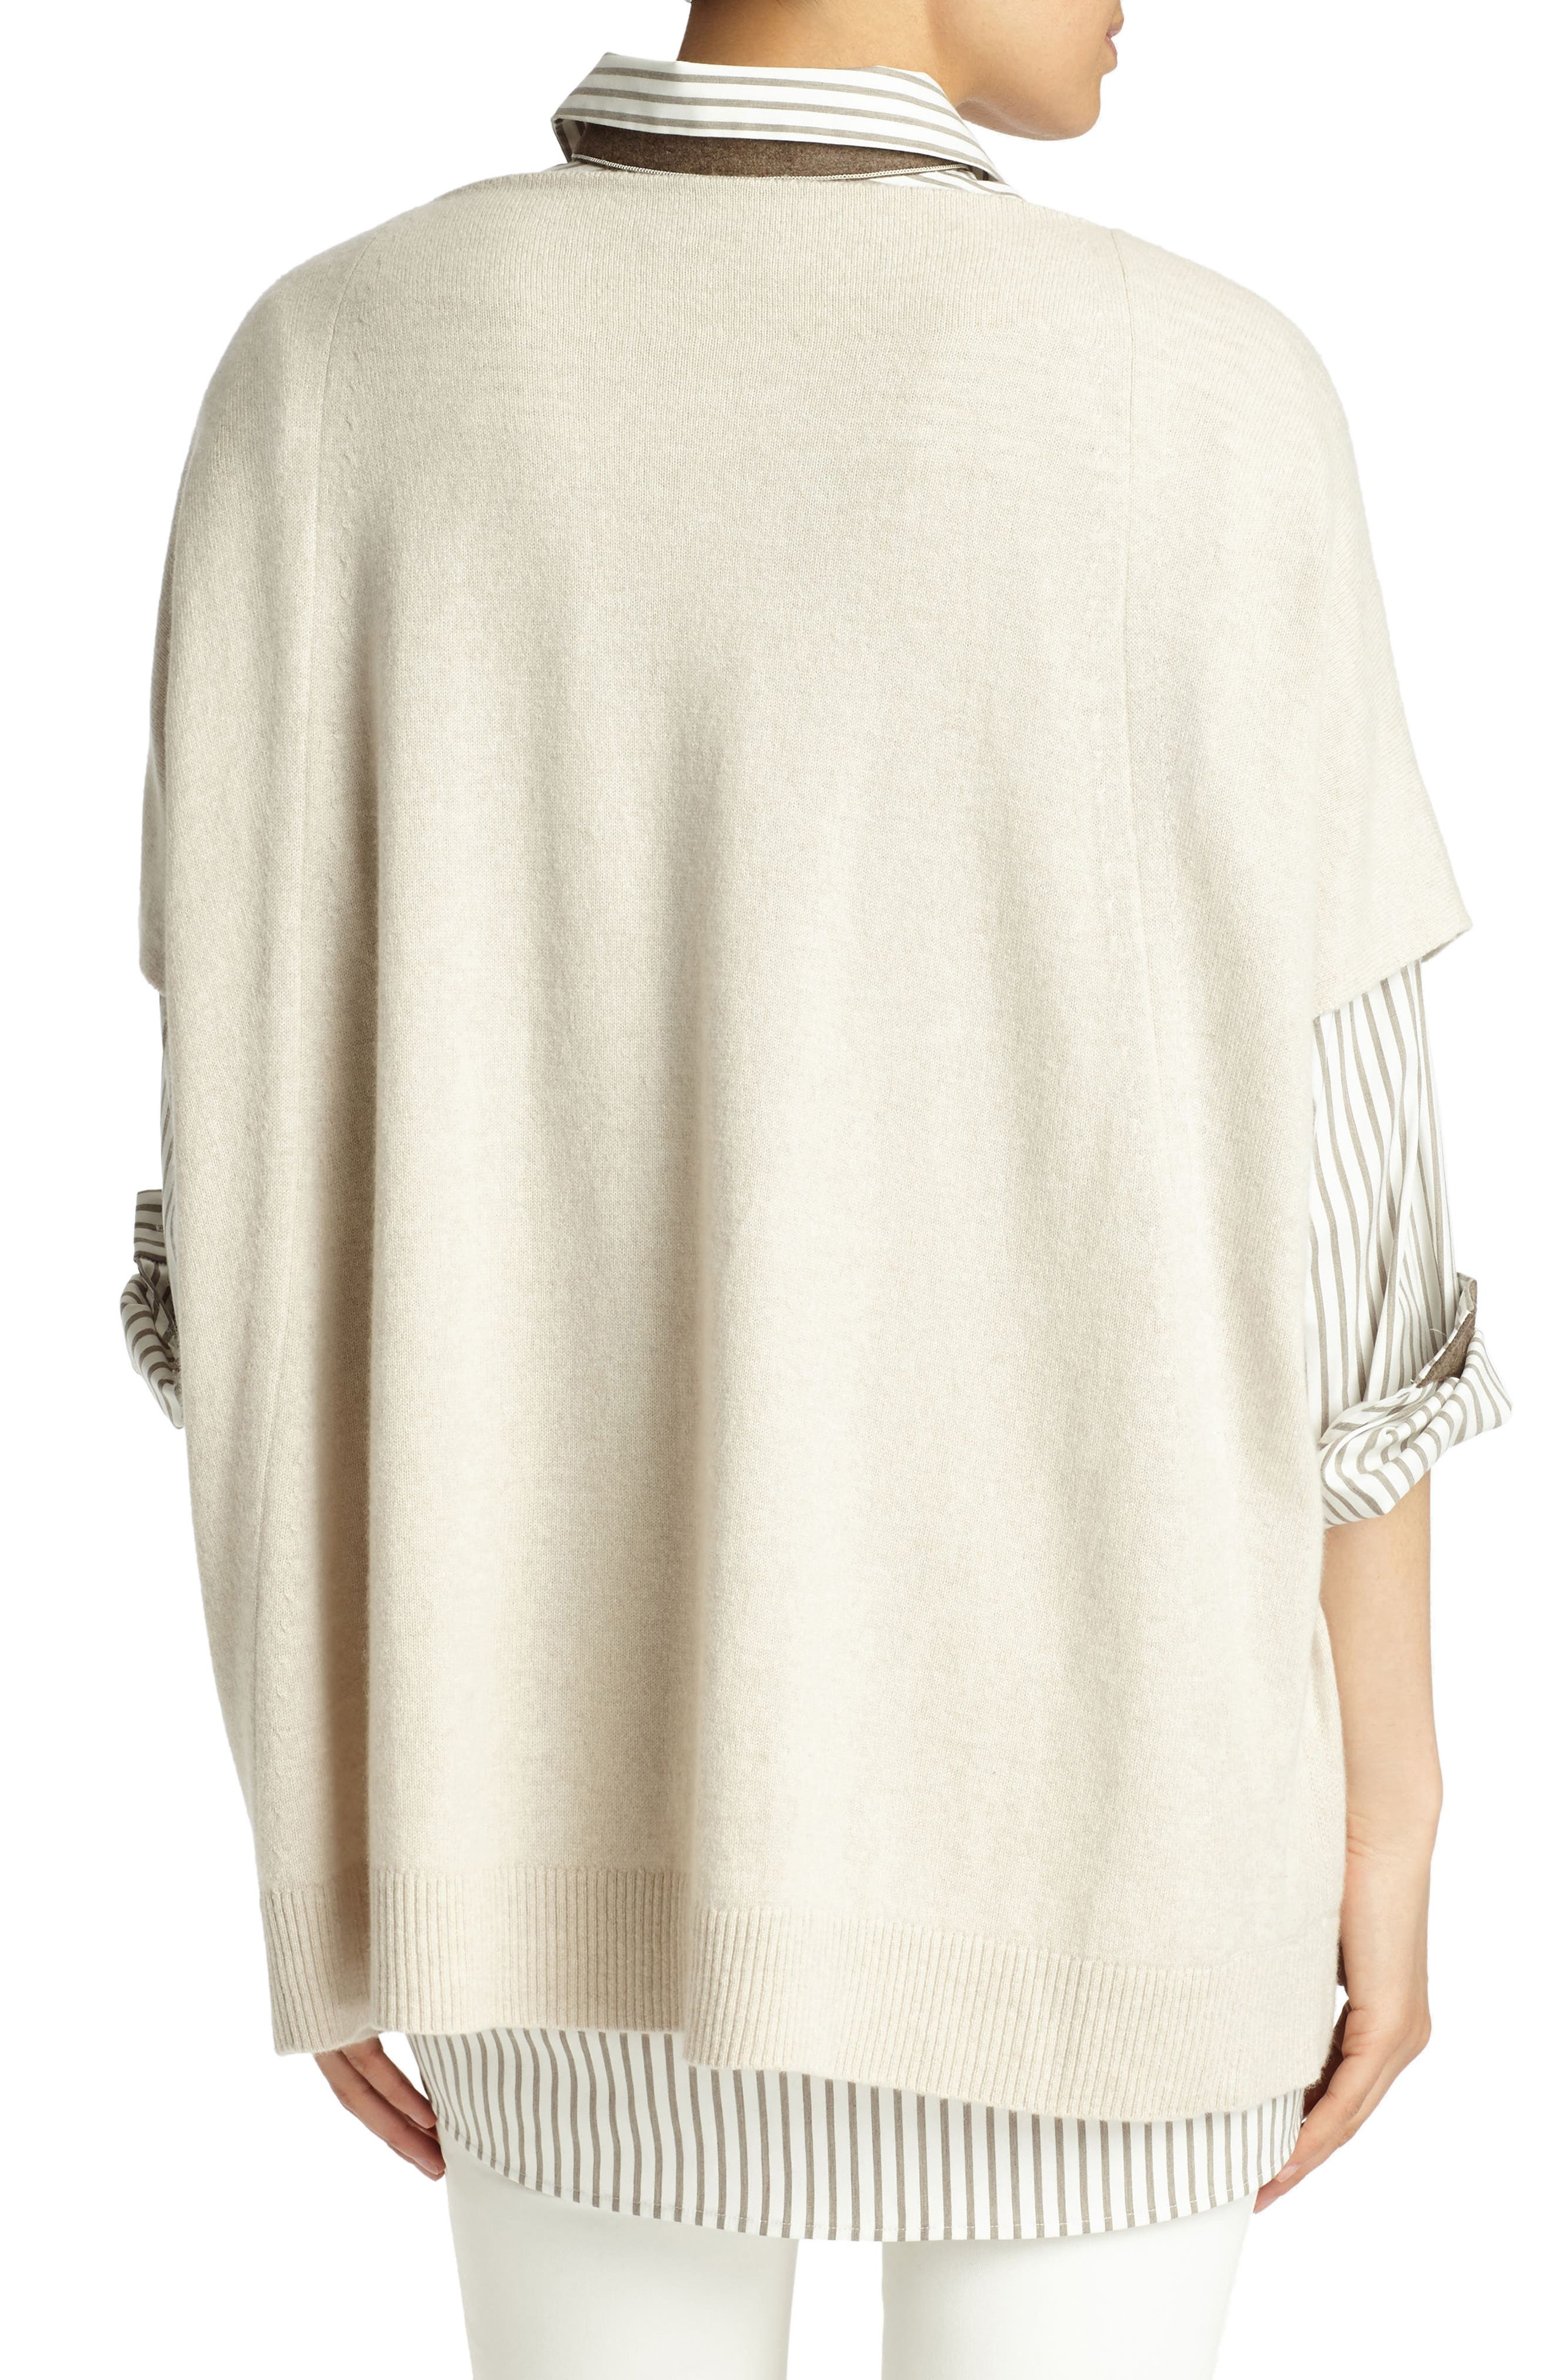 Cashmere Sweater,                             Alternate thumbnail 2, color,                             Oatmeal Melange